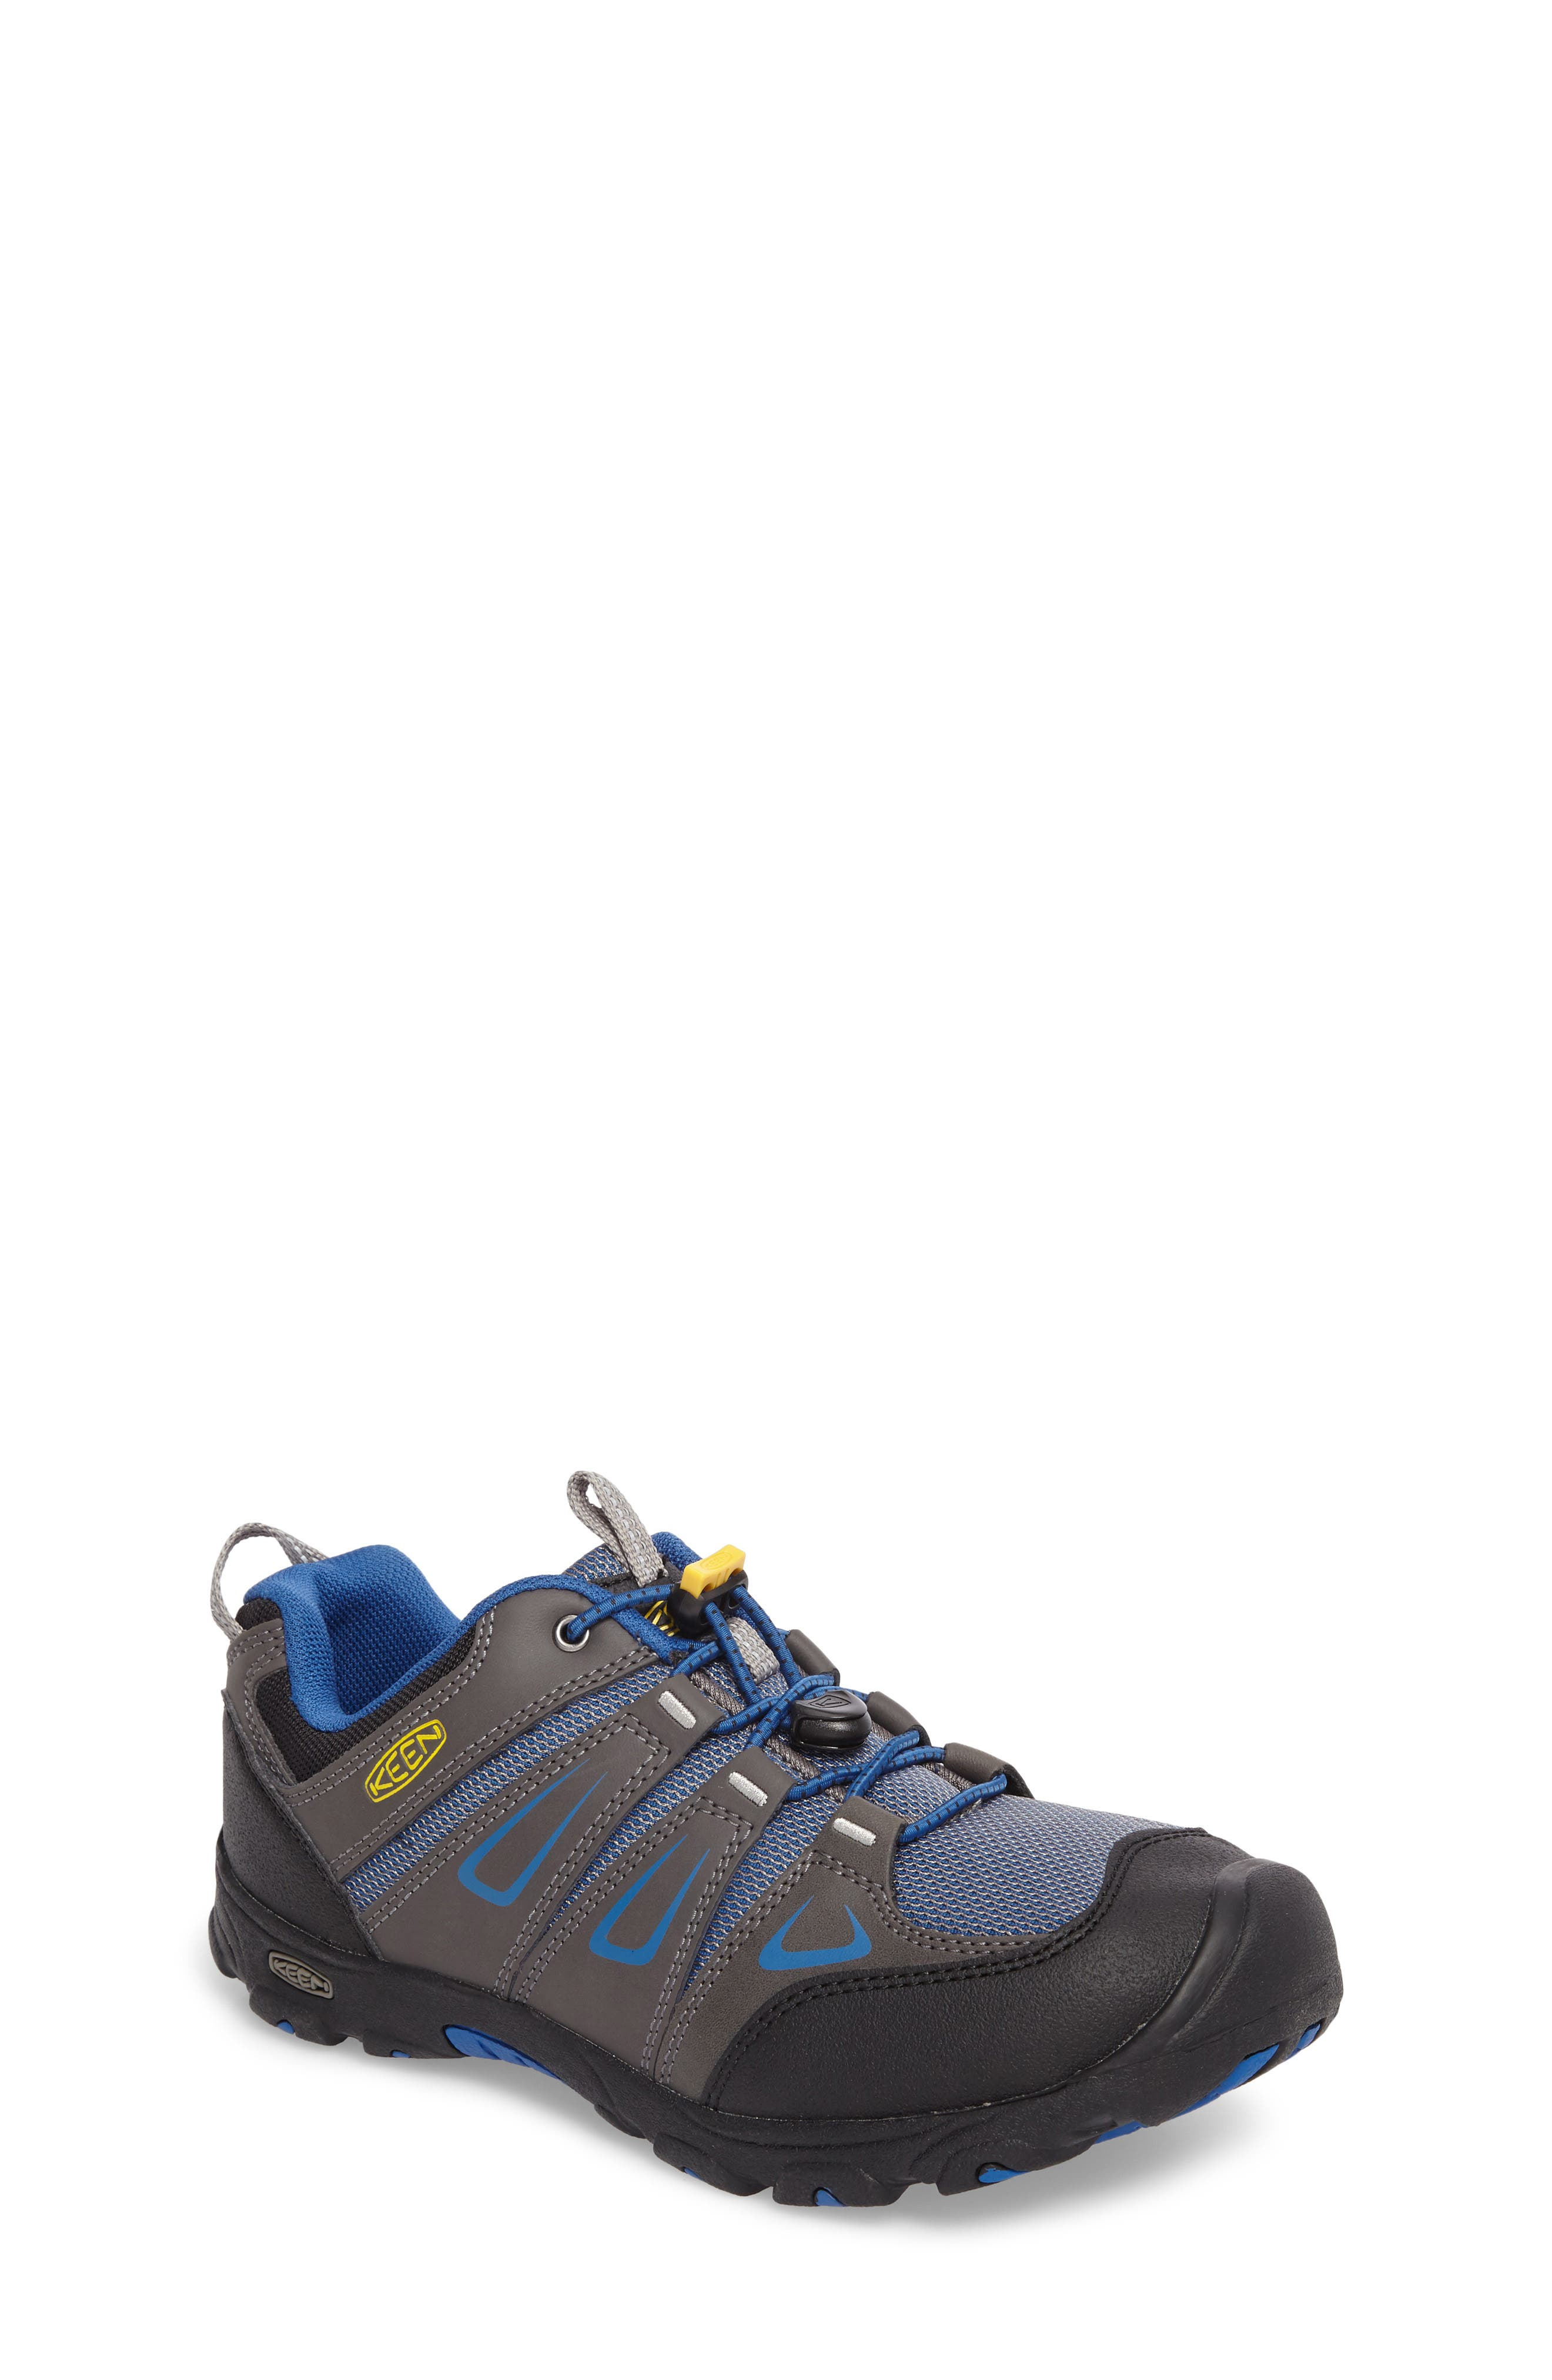 Oakridge Hiking Shoe,                             Main thumbnail 1, color,                             017